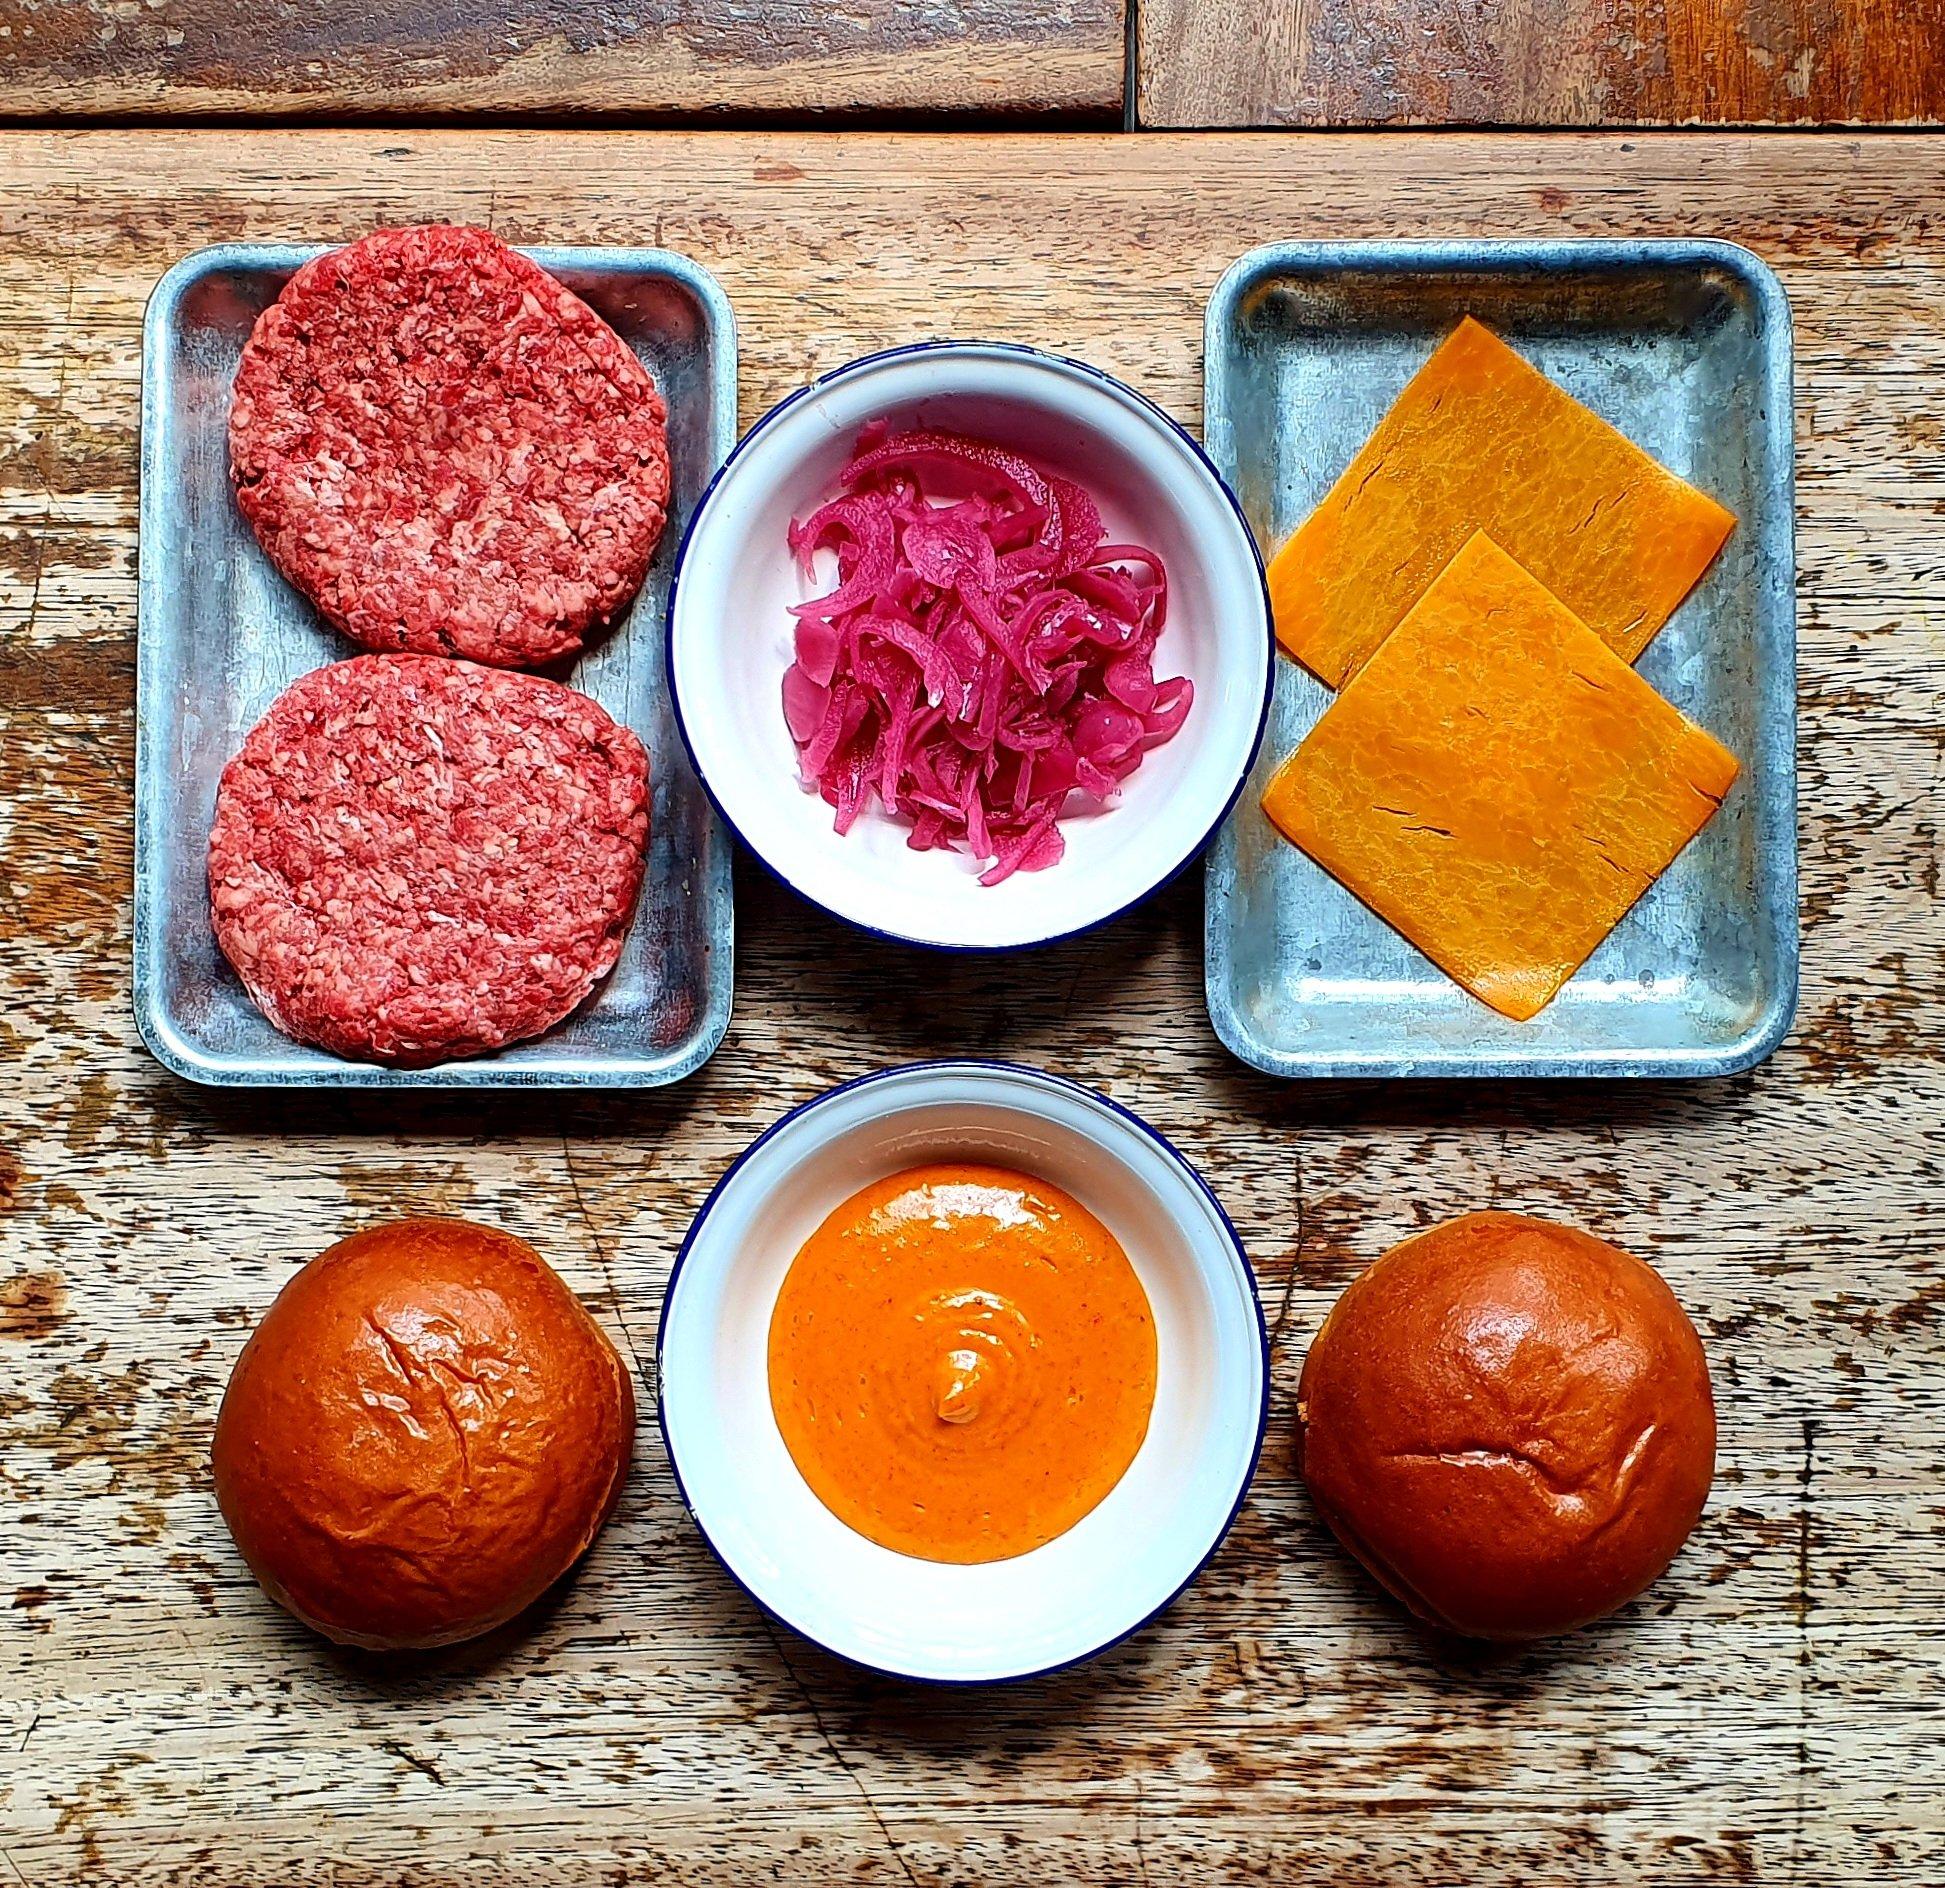 'Ari Gold' Cheeseburger Kit